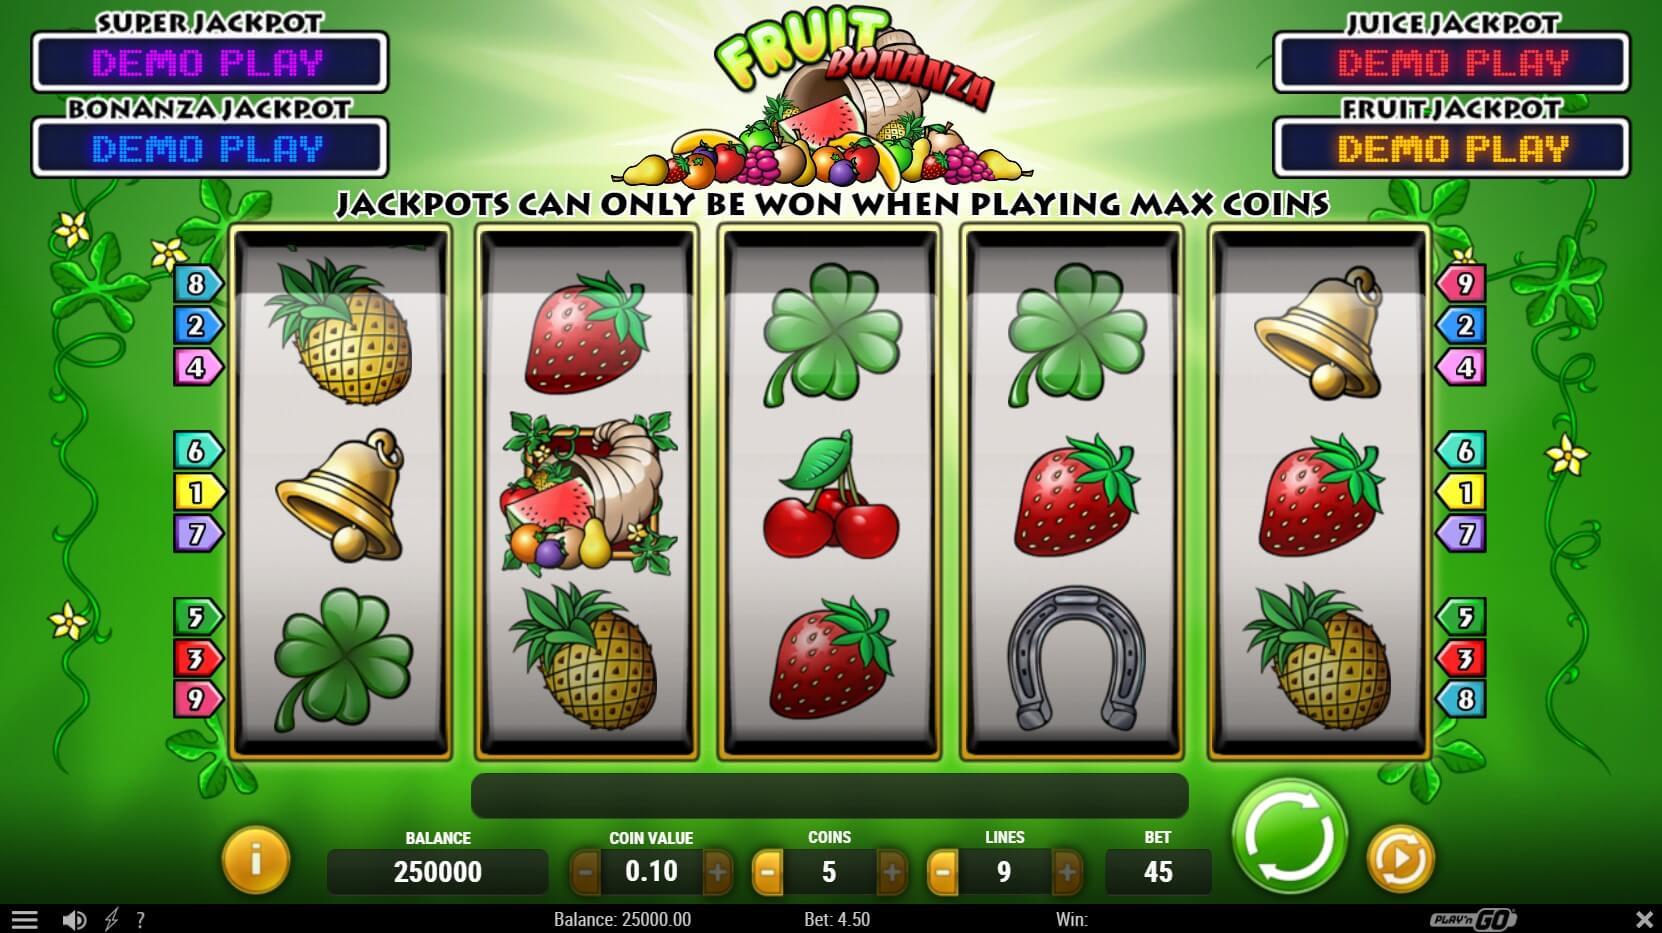 Unibet poker no deposit bonus